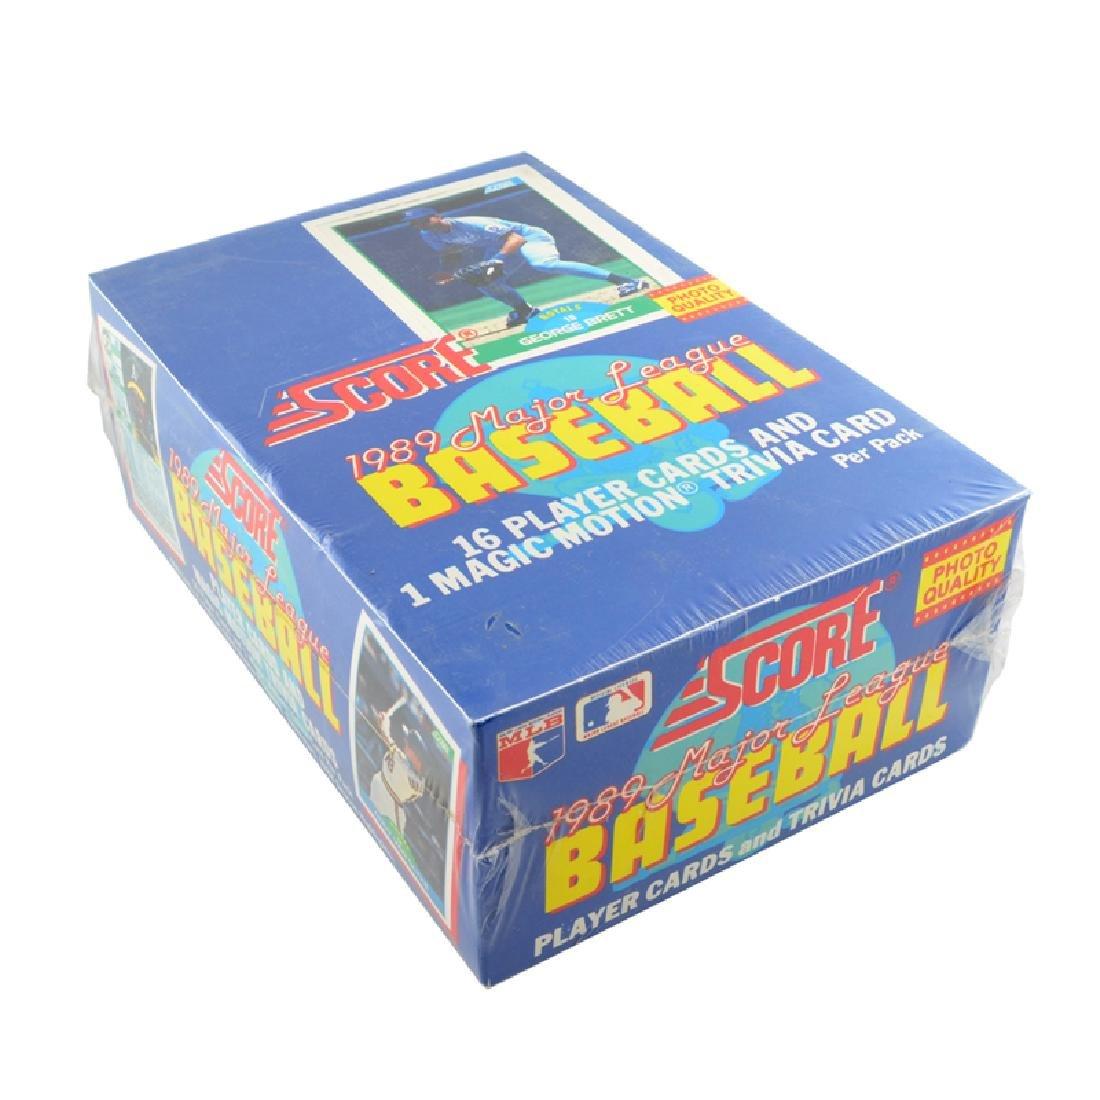 1989  Box of Score Major League Baseball Cards 36ct